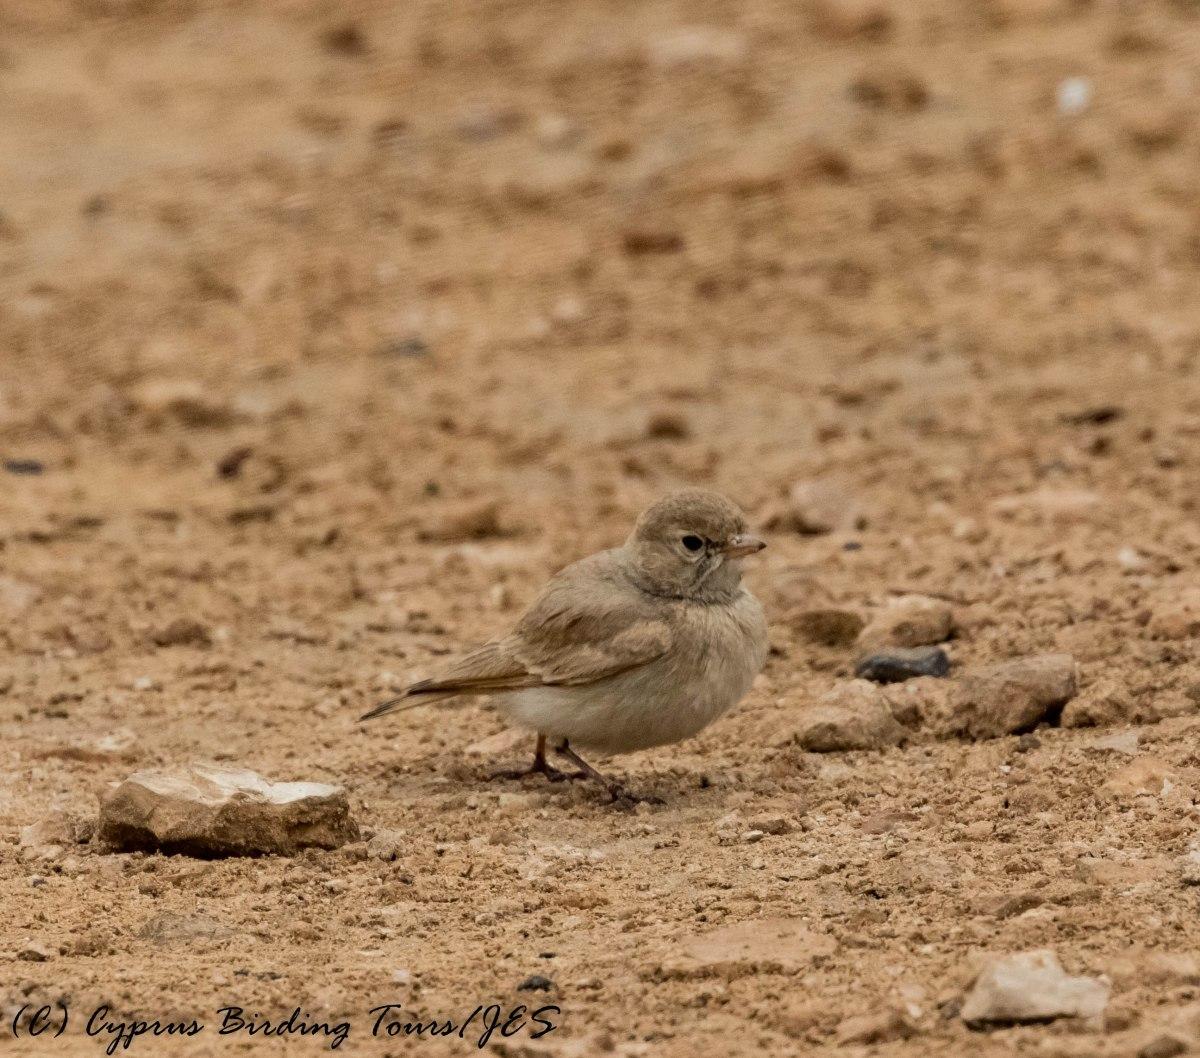 Bar-tailed Lark, Cape Greco 13th April 2017 (c) Cyprus Birding Tours